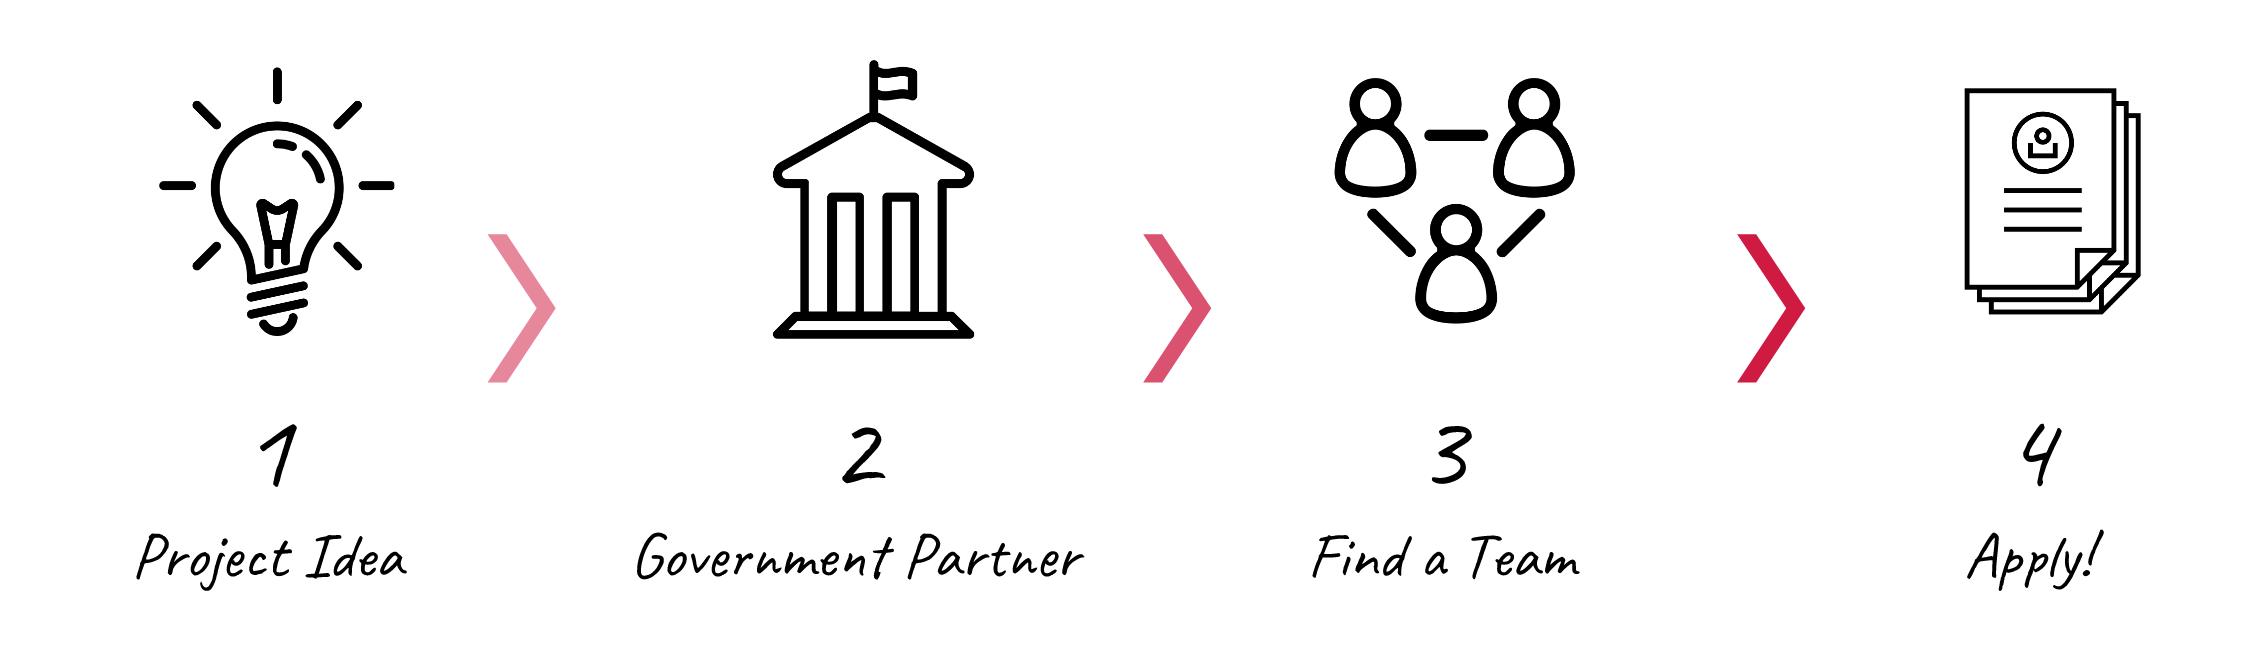 2018-fellowship-apply-diagram2.png#asset